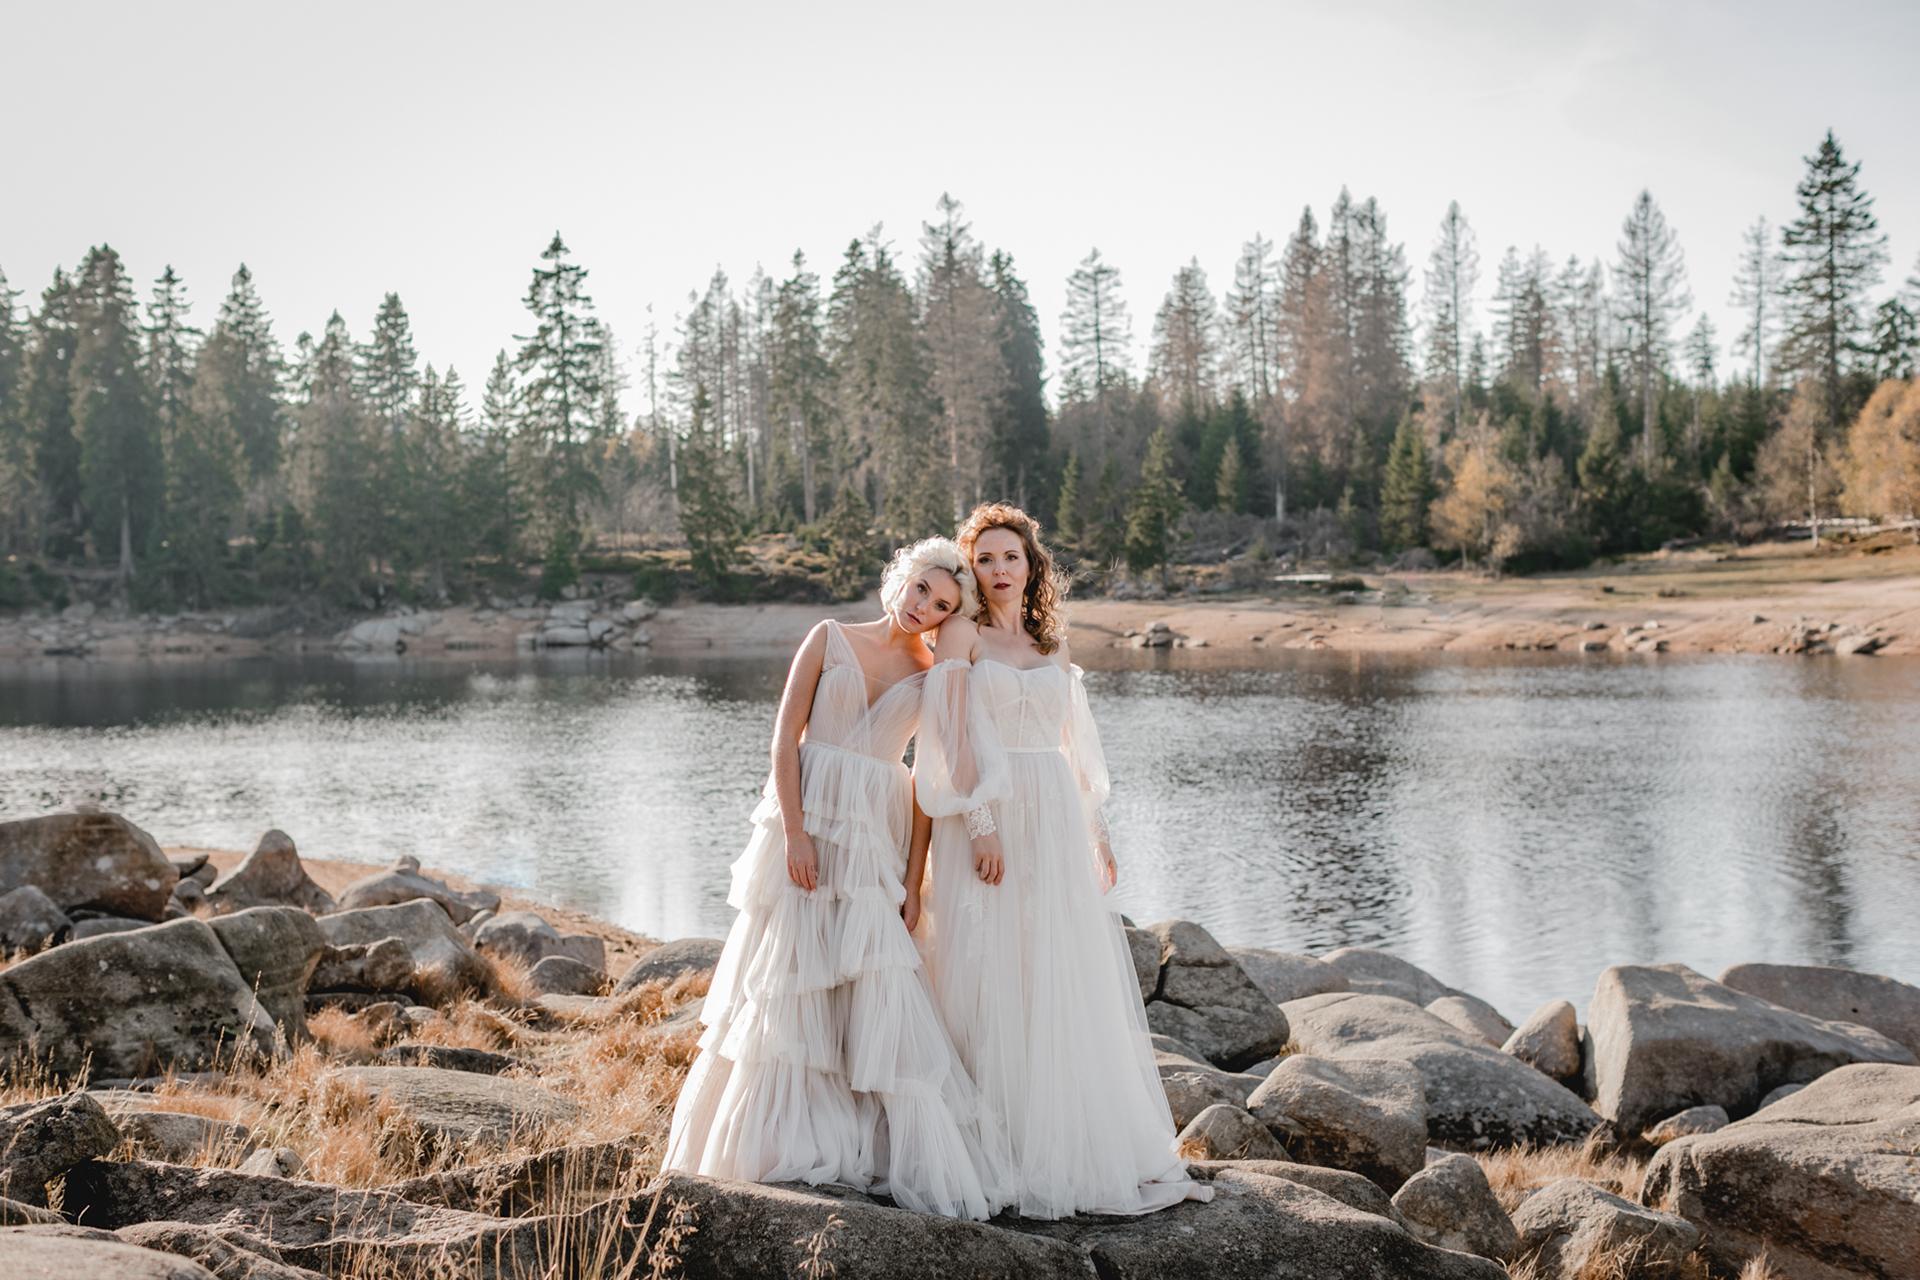 Verspielte Brautkleider - Feelings Braut & Festmode